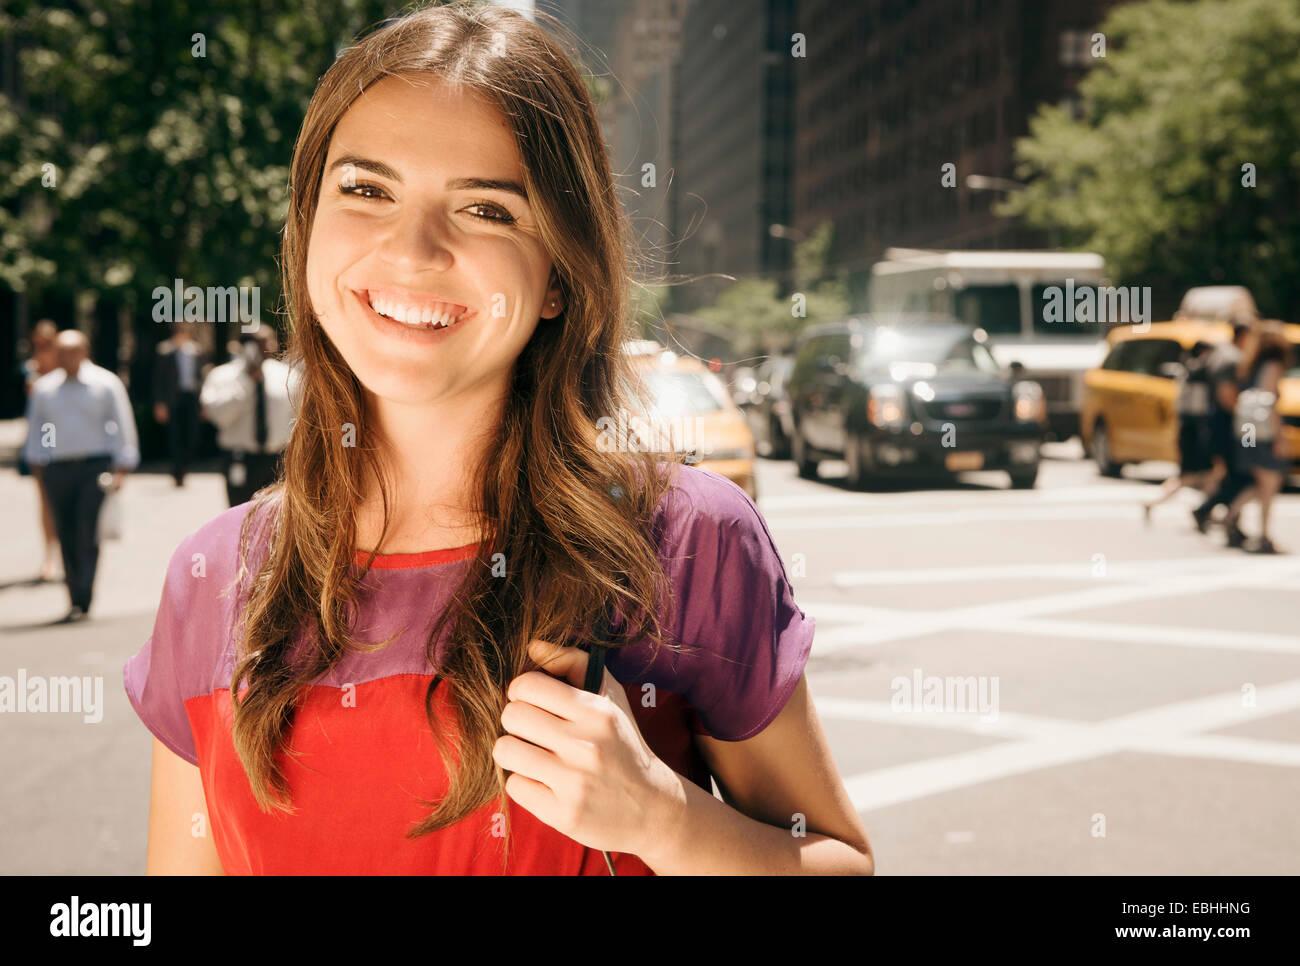 Mujer joven con largo pelo castaño en streetscene Imagen De Stock